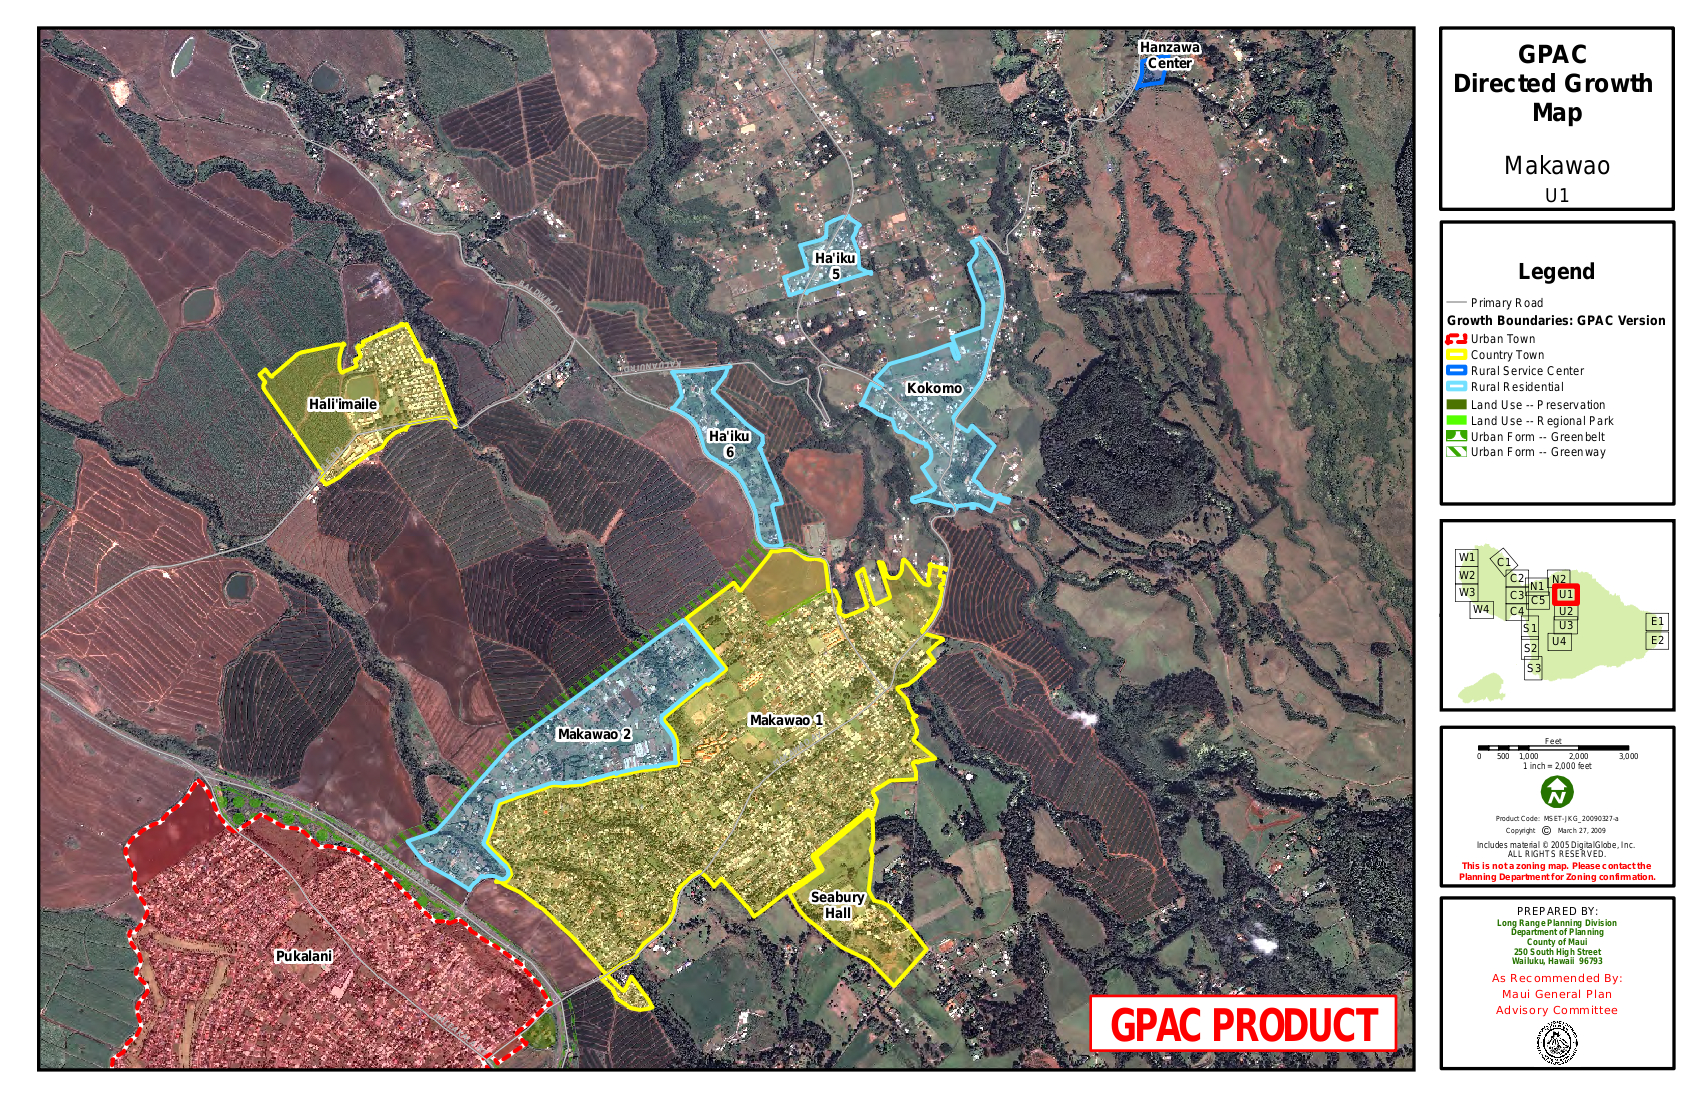 GPAC Directed Growth Map Makawao